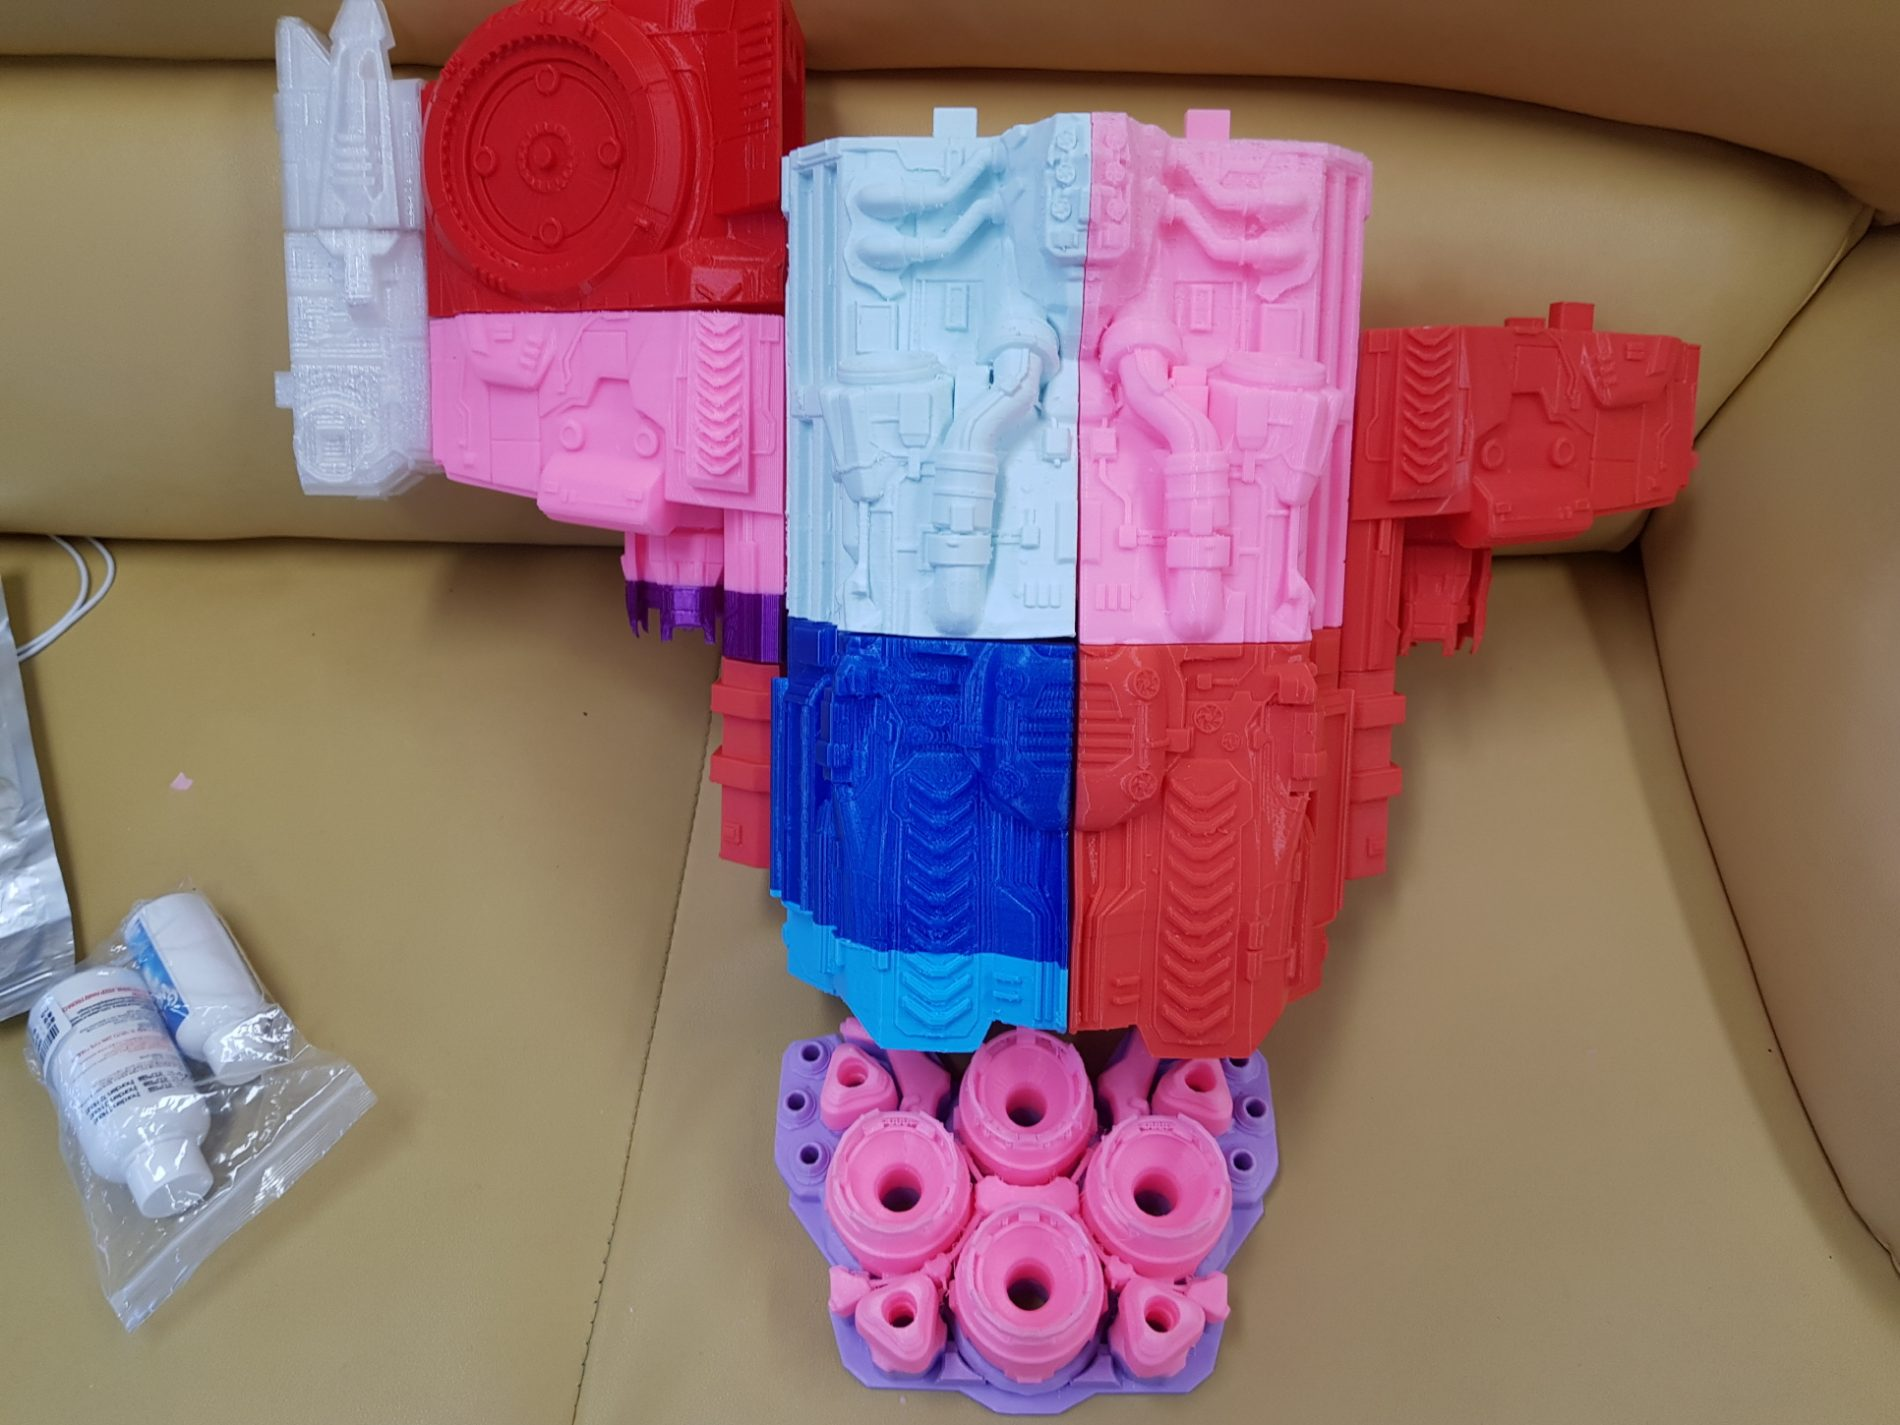 Battlecruiser 3D Printing model photo 3